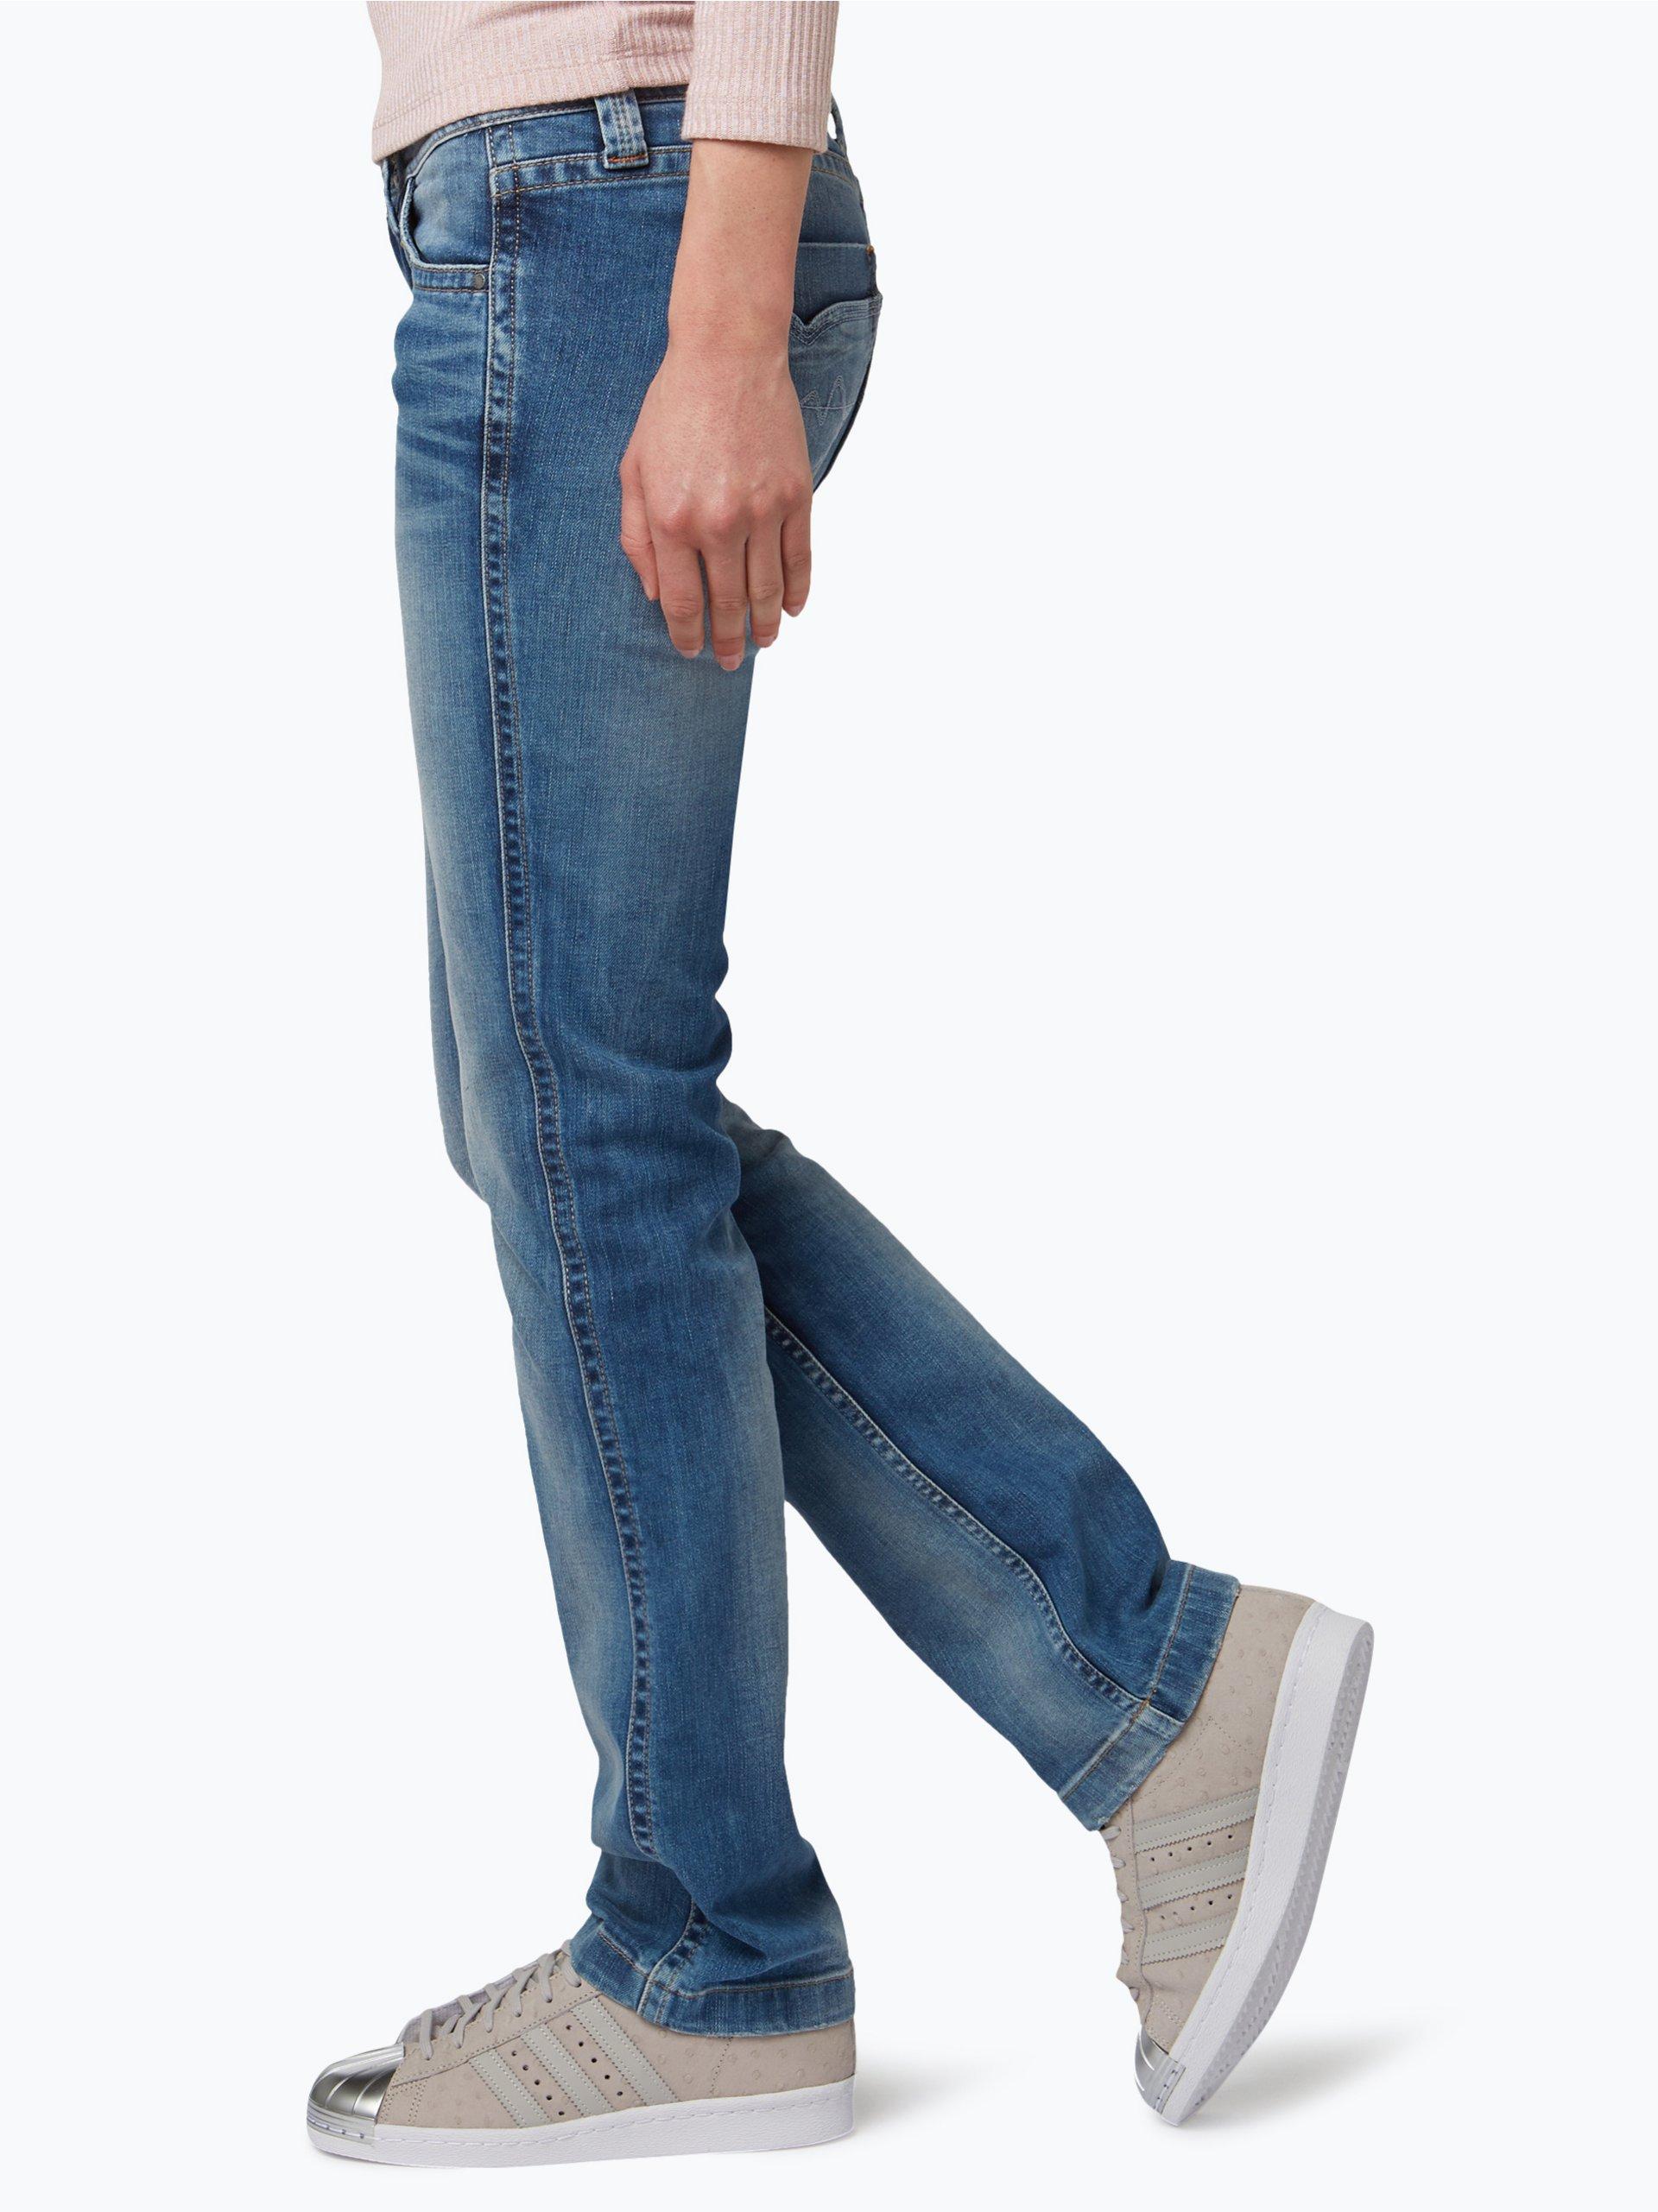 pepe jeans damen jeans banji hellblau blau uni online kaufen vangraaf com. Black Bedroom Furniture Sets. Home Design Ideas